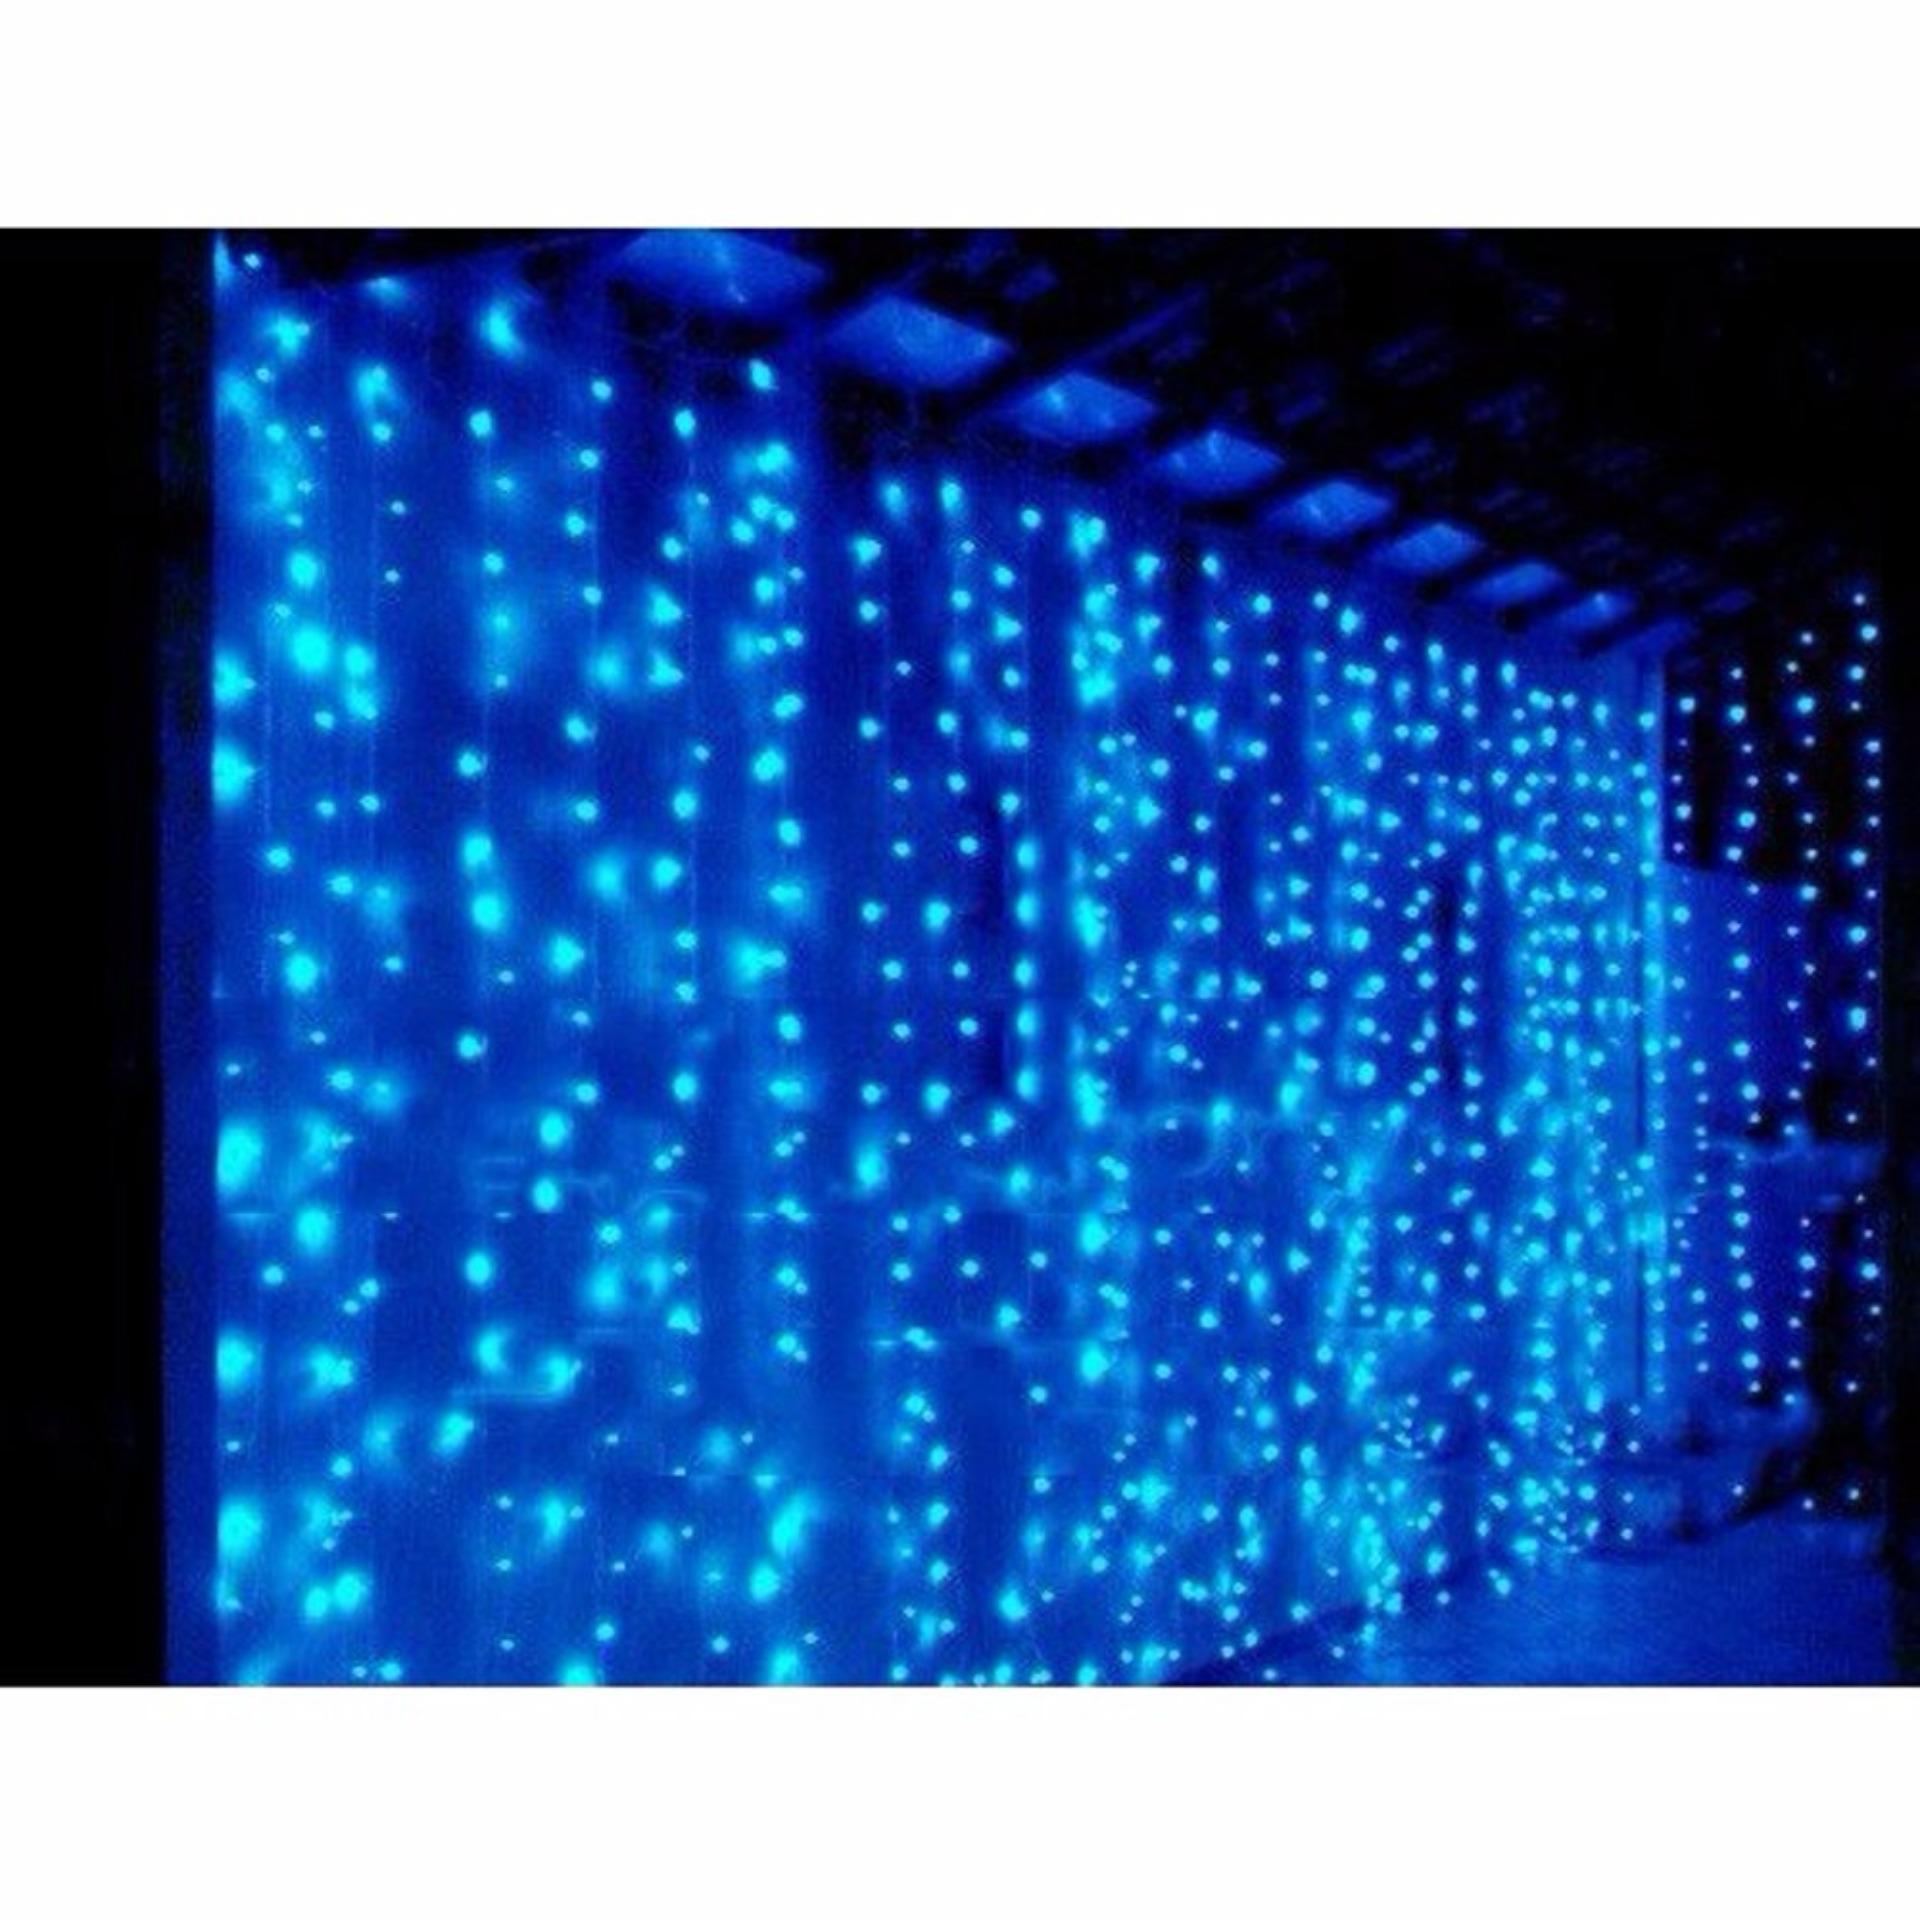 Buy Sell Cheapest Natal Led Biru Best Quality Product Deals Lampu Dekorasi Twinkle Light String Tumblr Warna 10 Meter